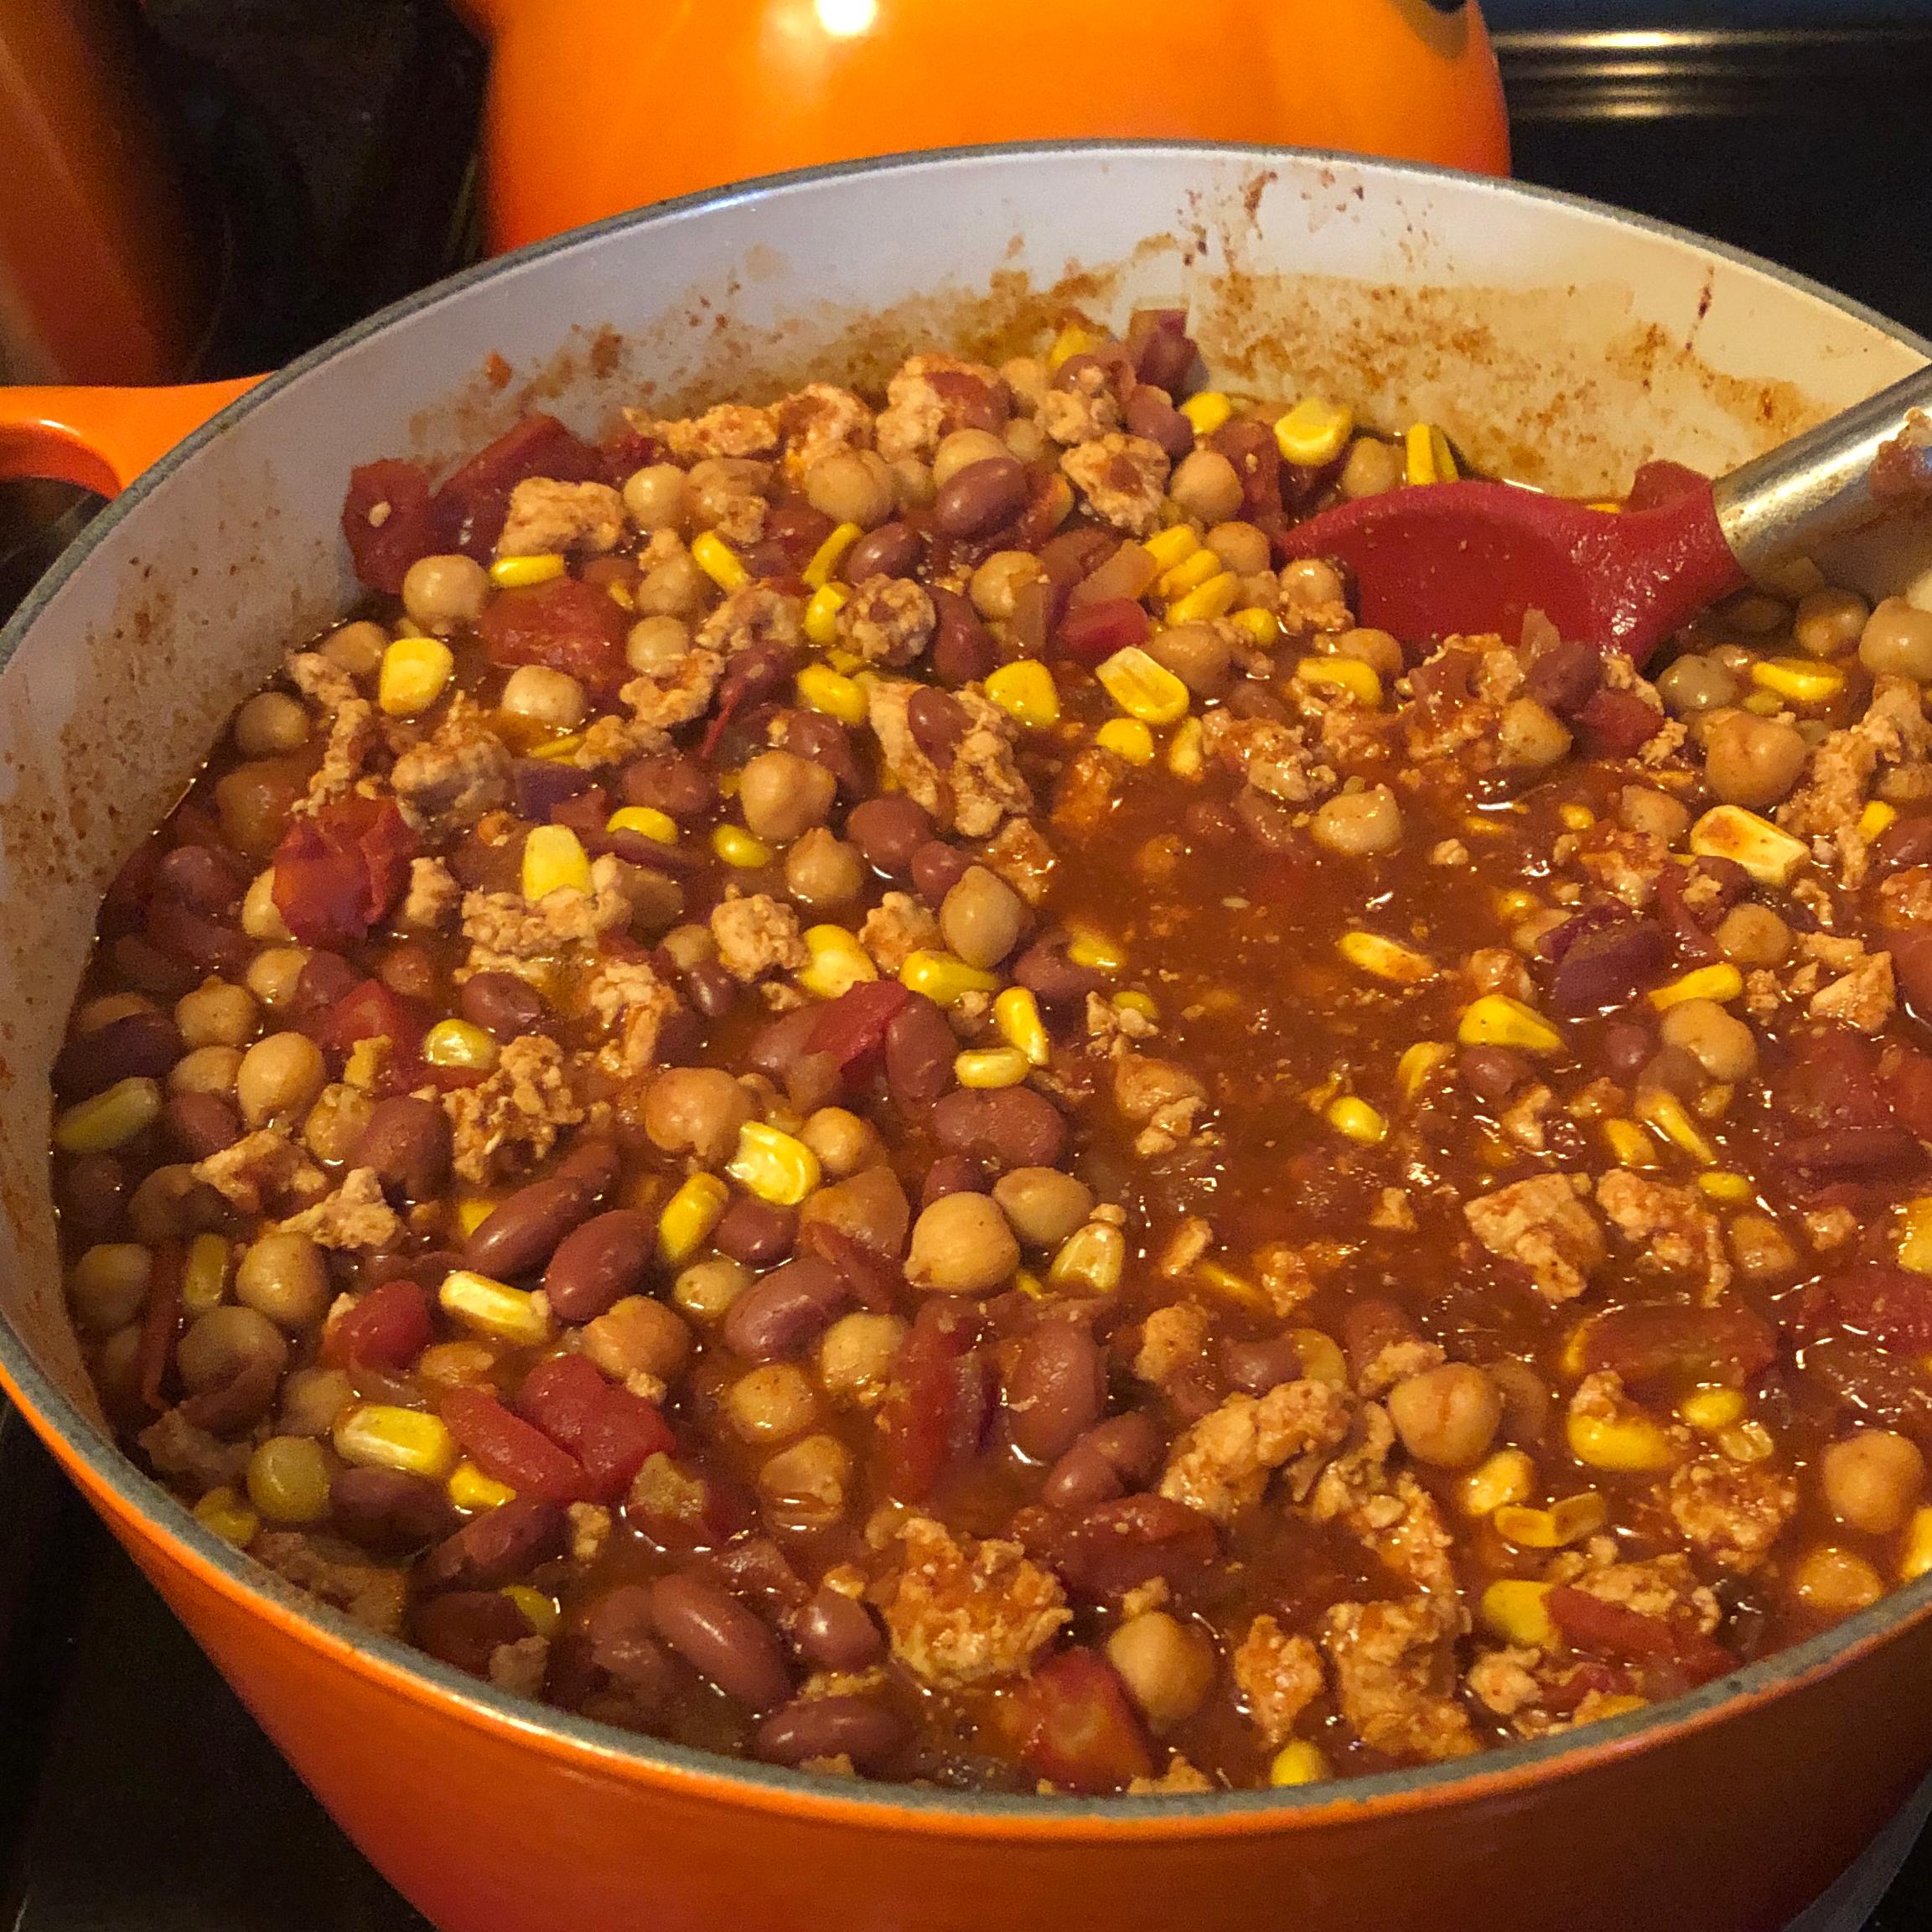 World S Best Turkey Chili Recipe Allrecipes